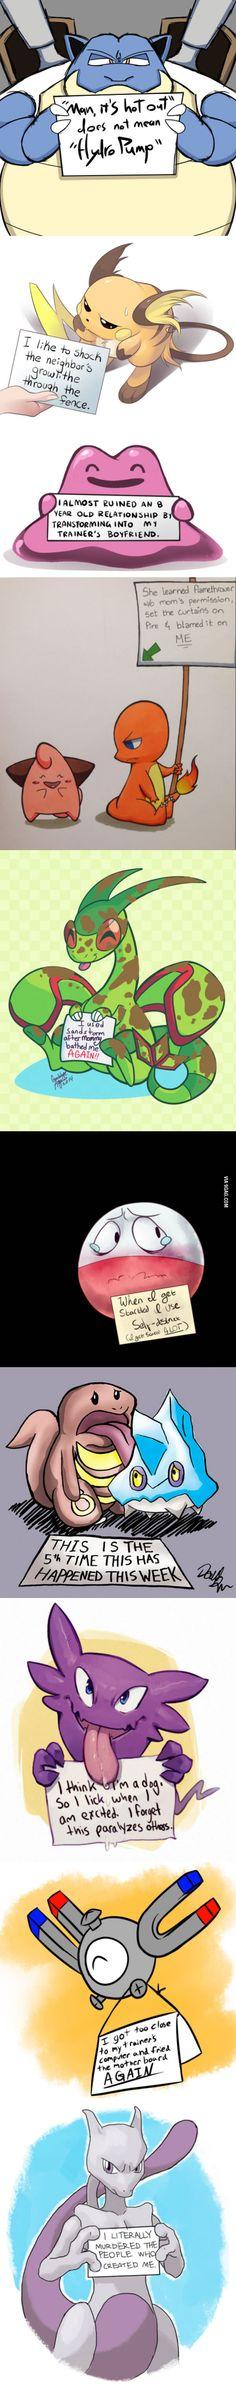 Pokemon Shaming - 9GAG